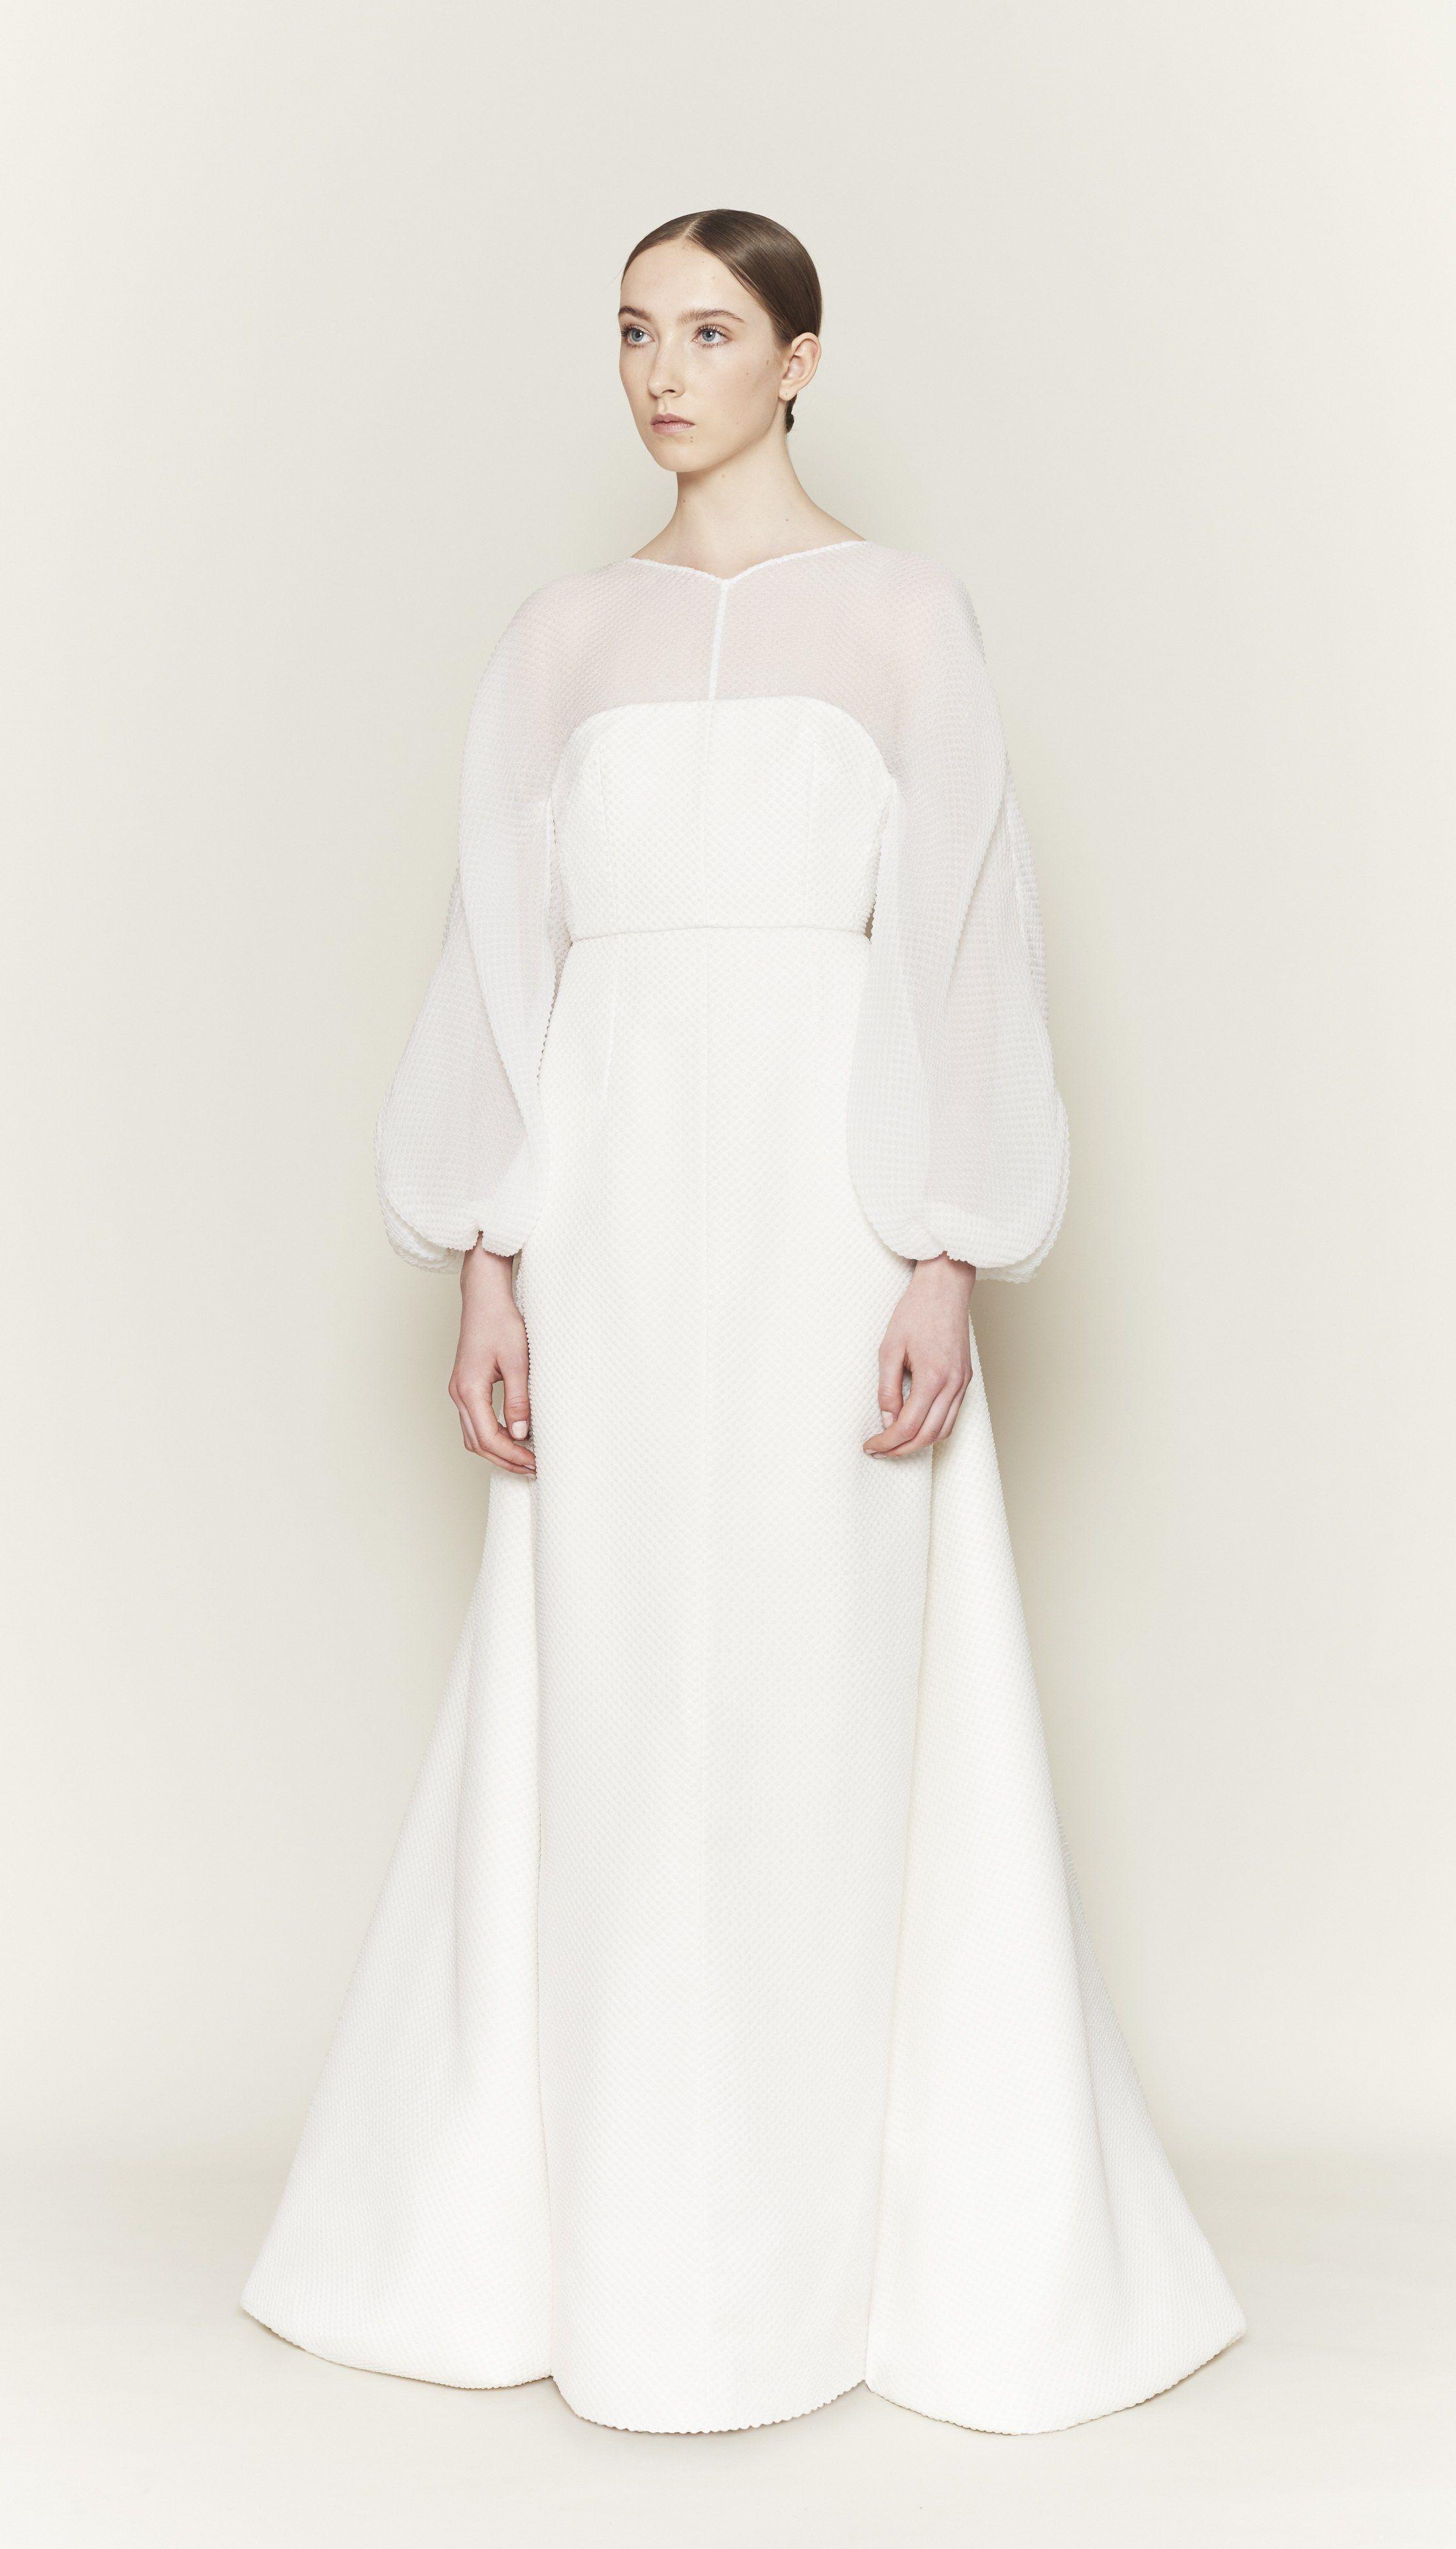 55 Long Sleeve Wedding Dresses for a Fall Wedding Brides